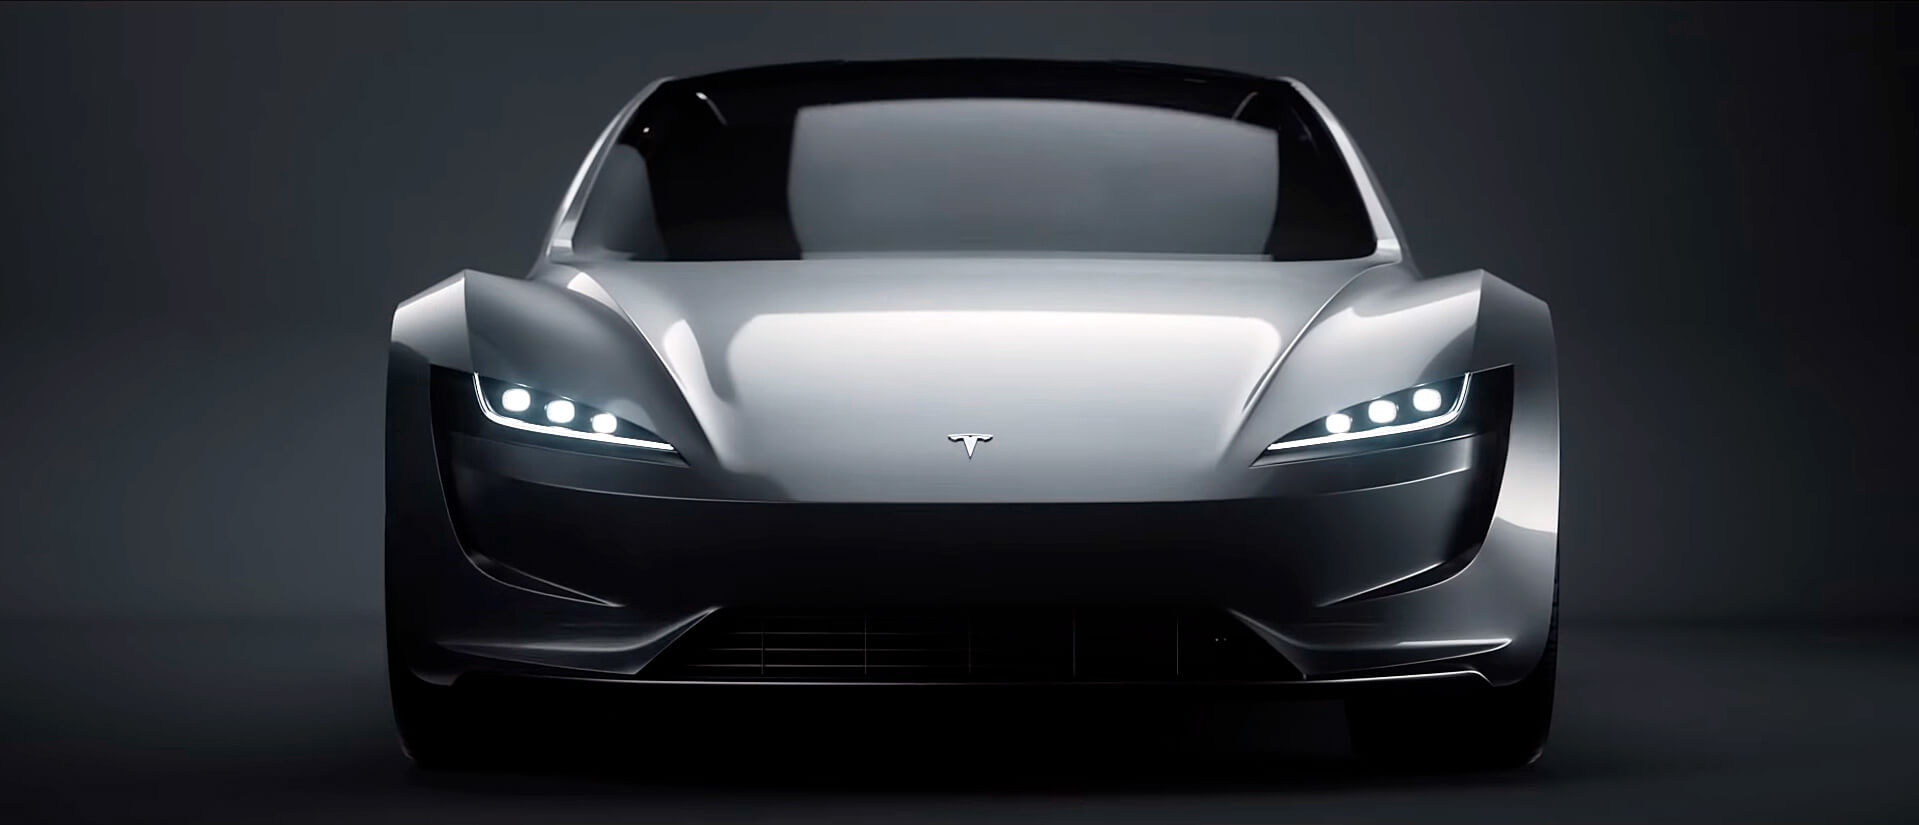 Tesla Roadster next-generation